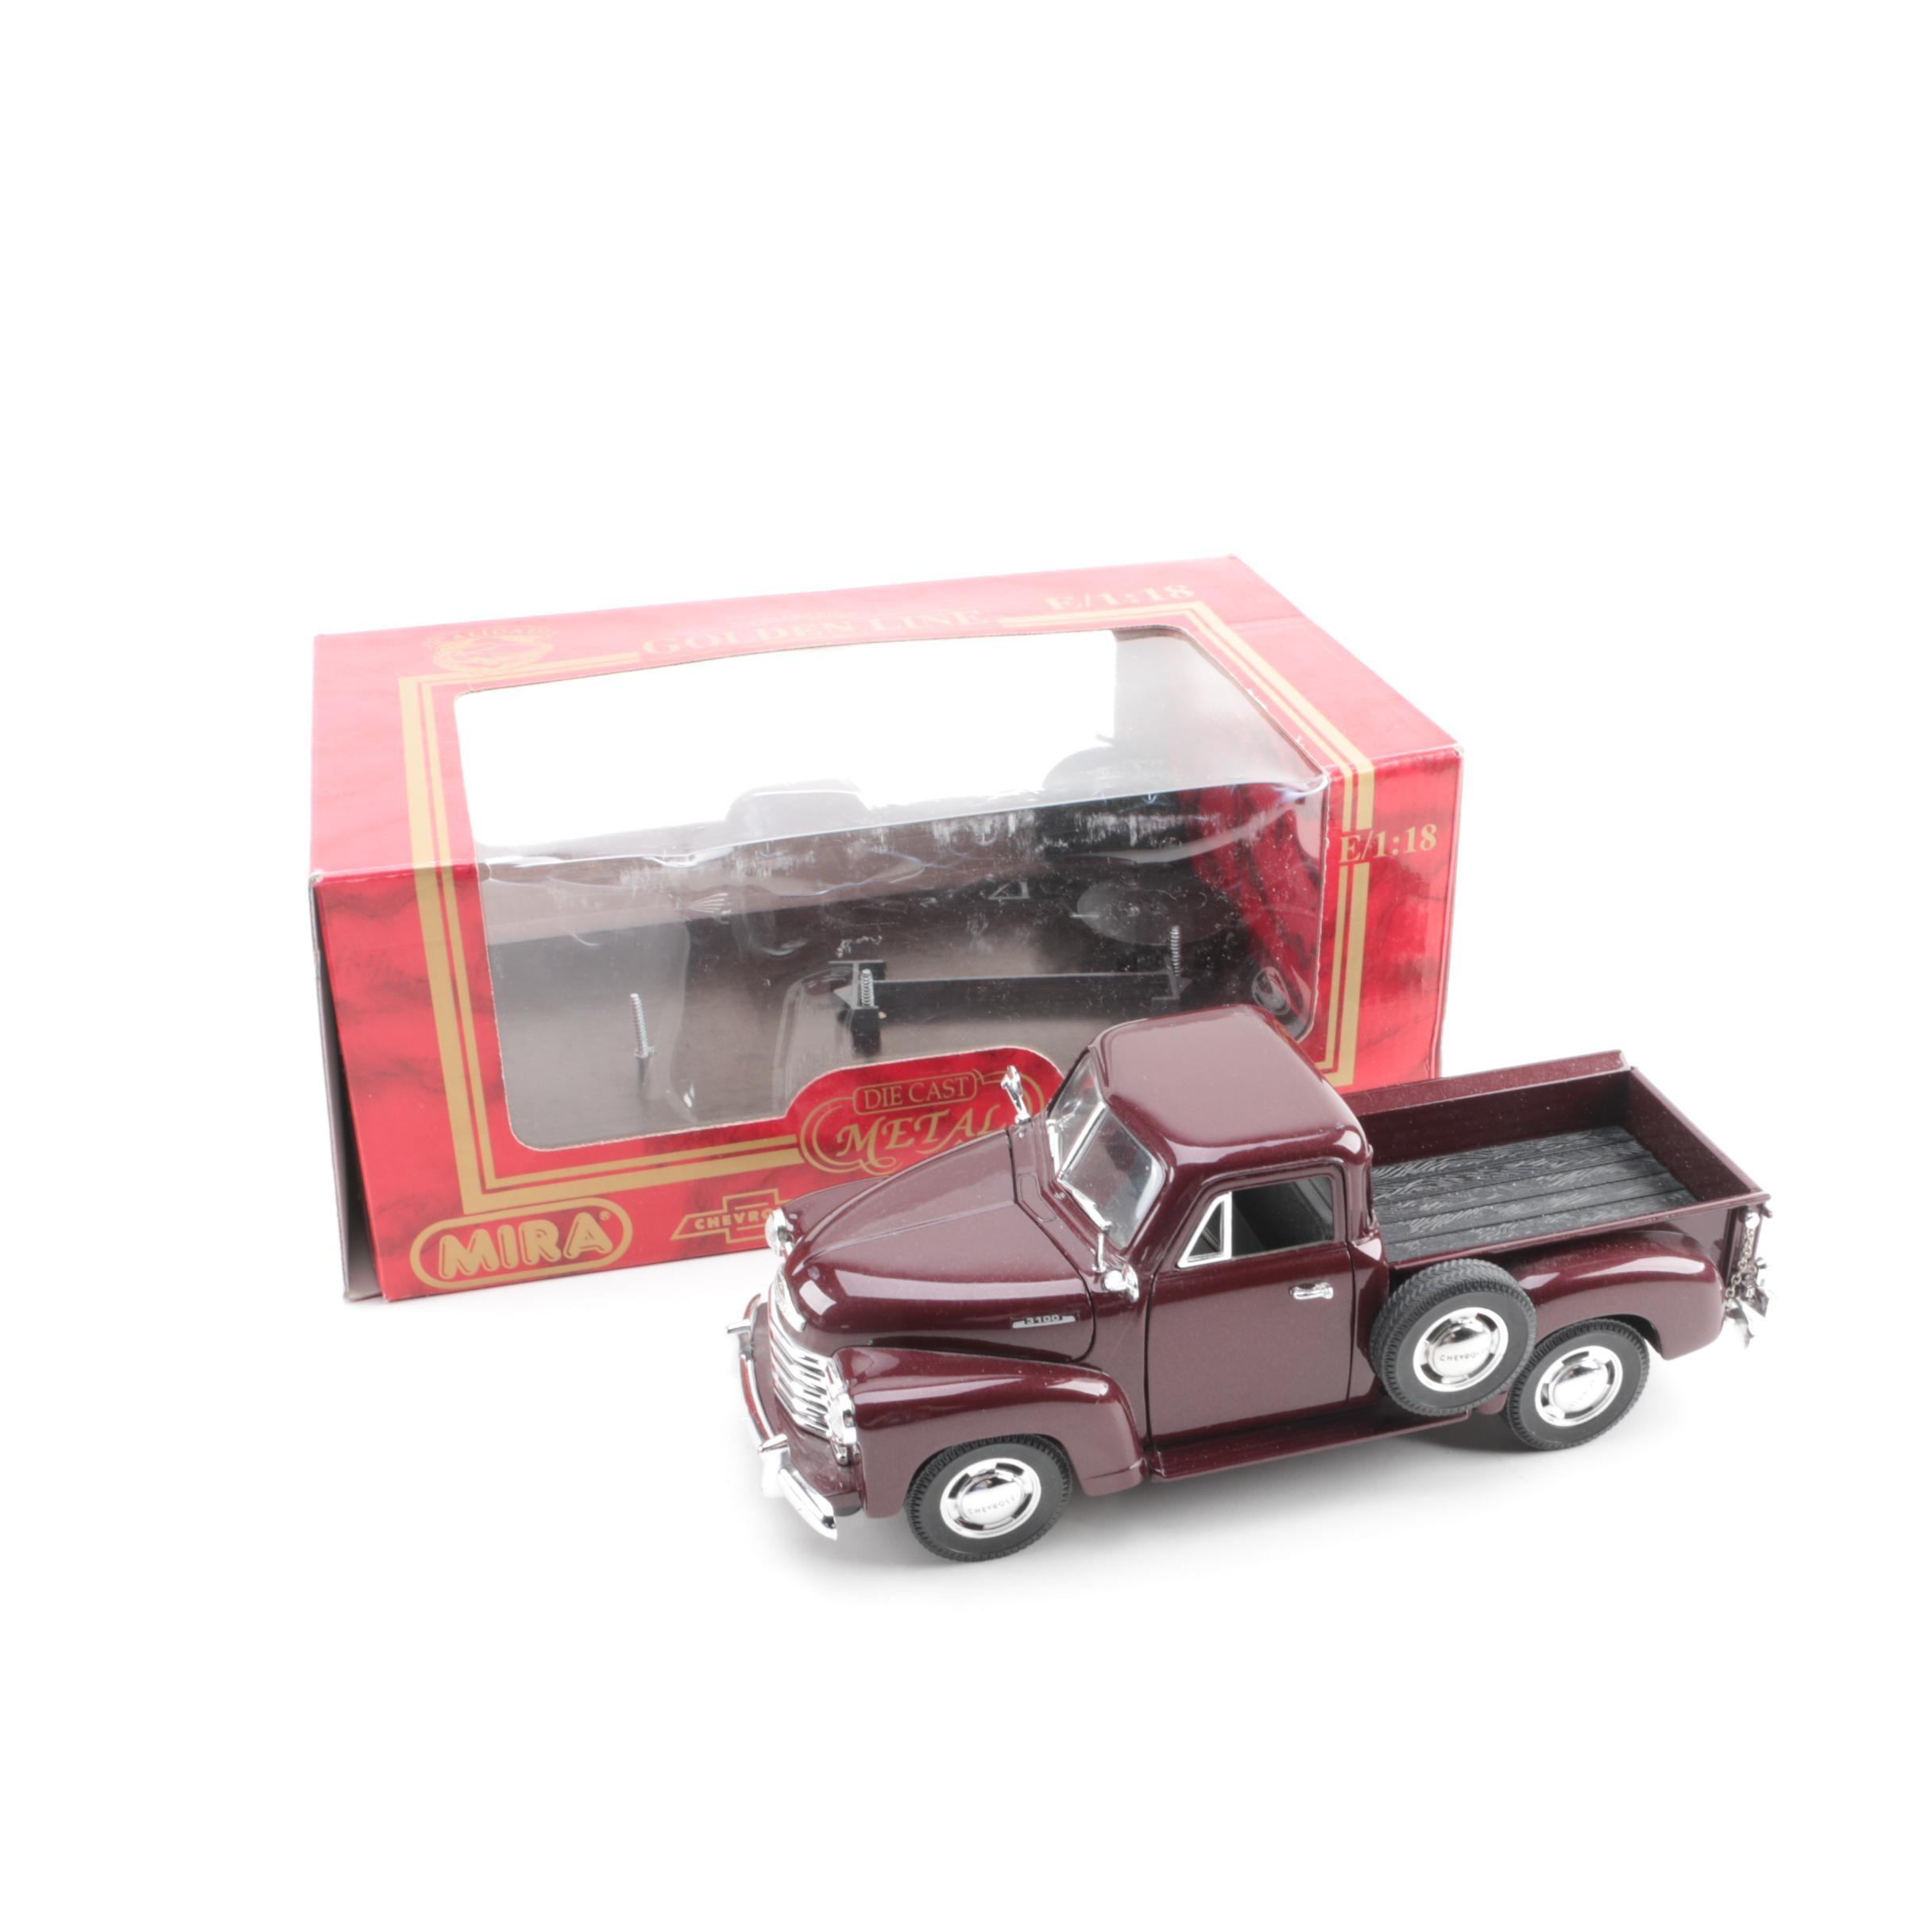 Mira Die-Cast 1953 Chevrolet 3100 Pickup Truck